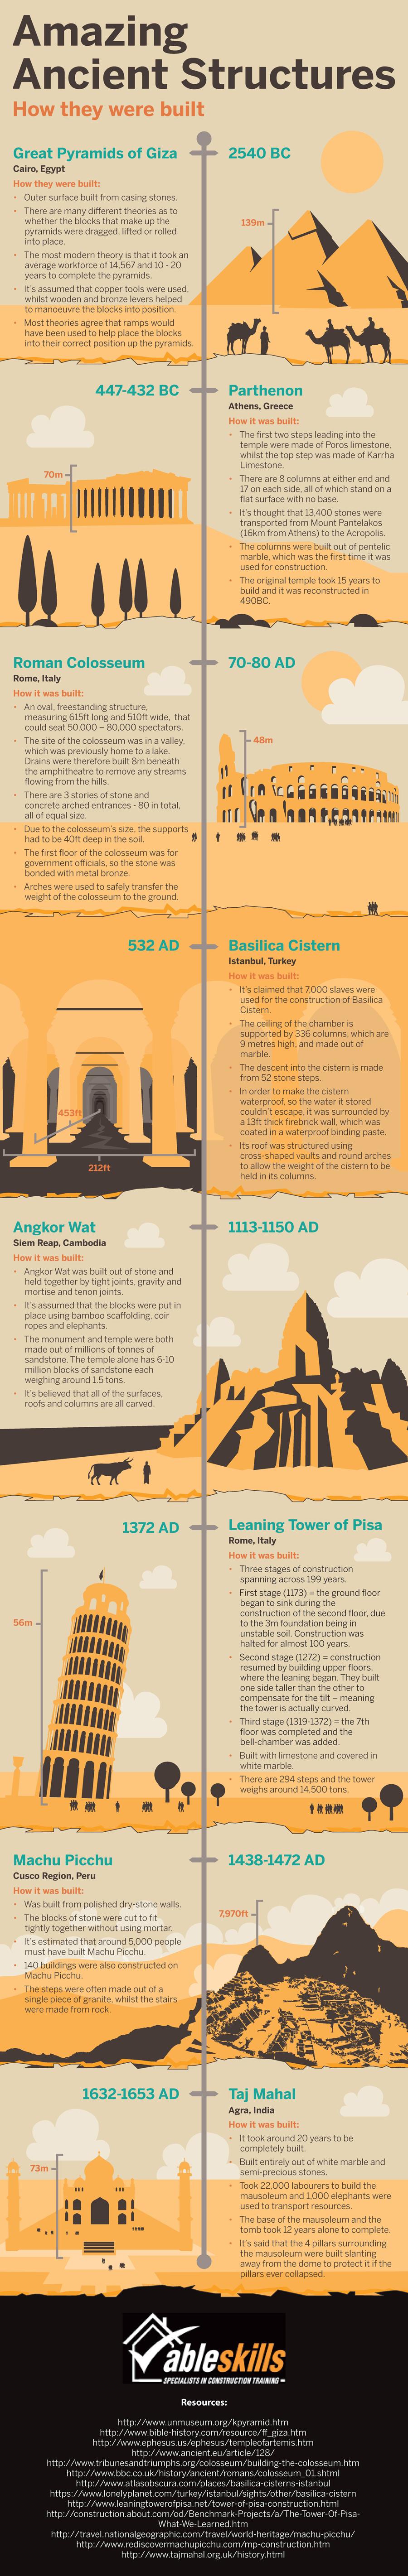 Infographic shows how Pyramids, Machu Picchu, Parthenon ...